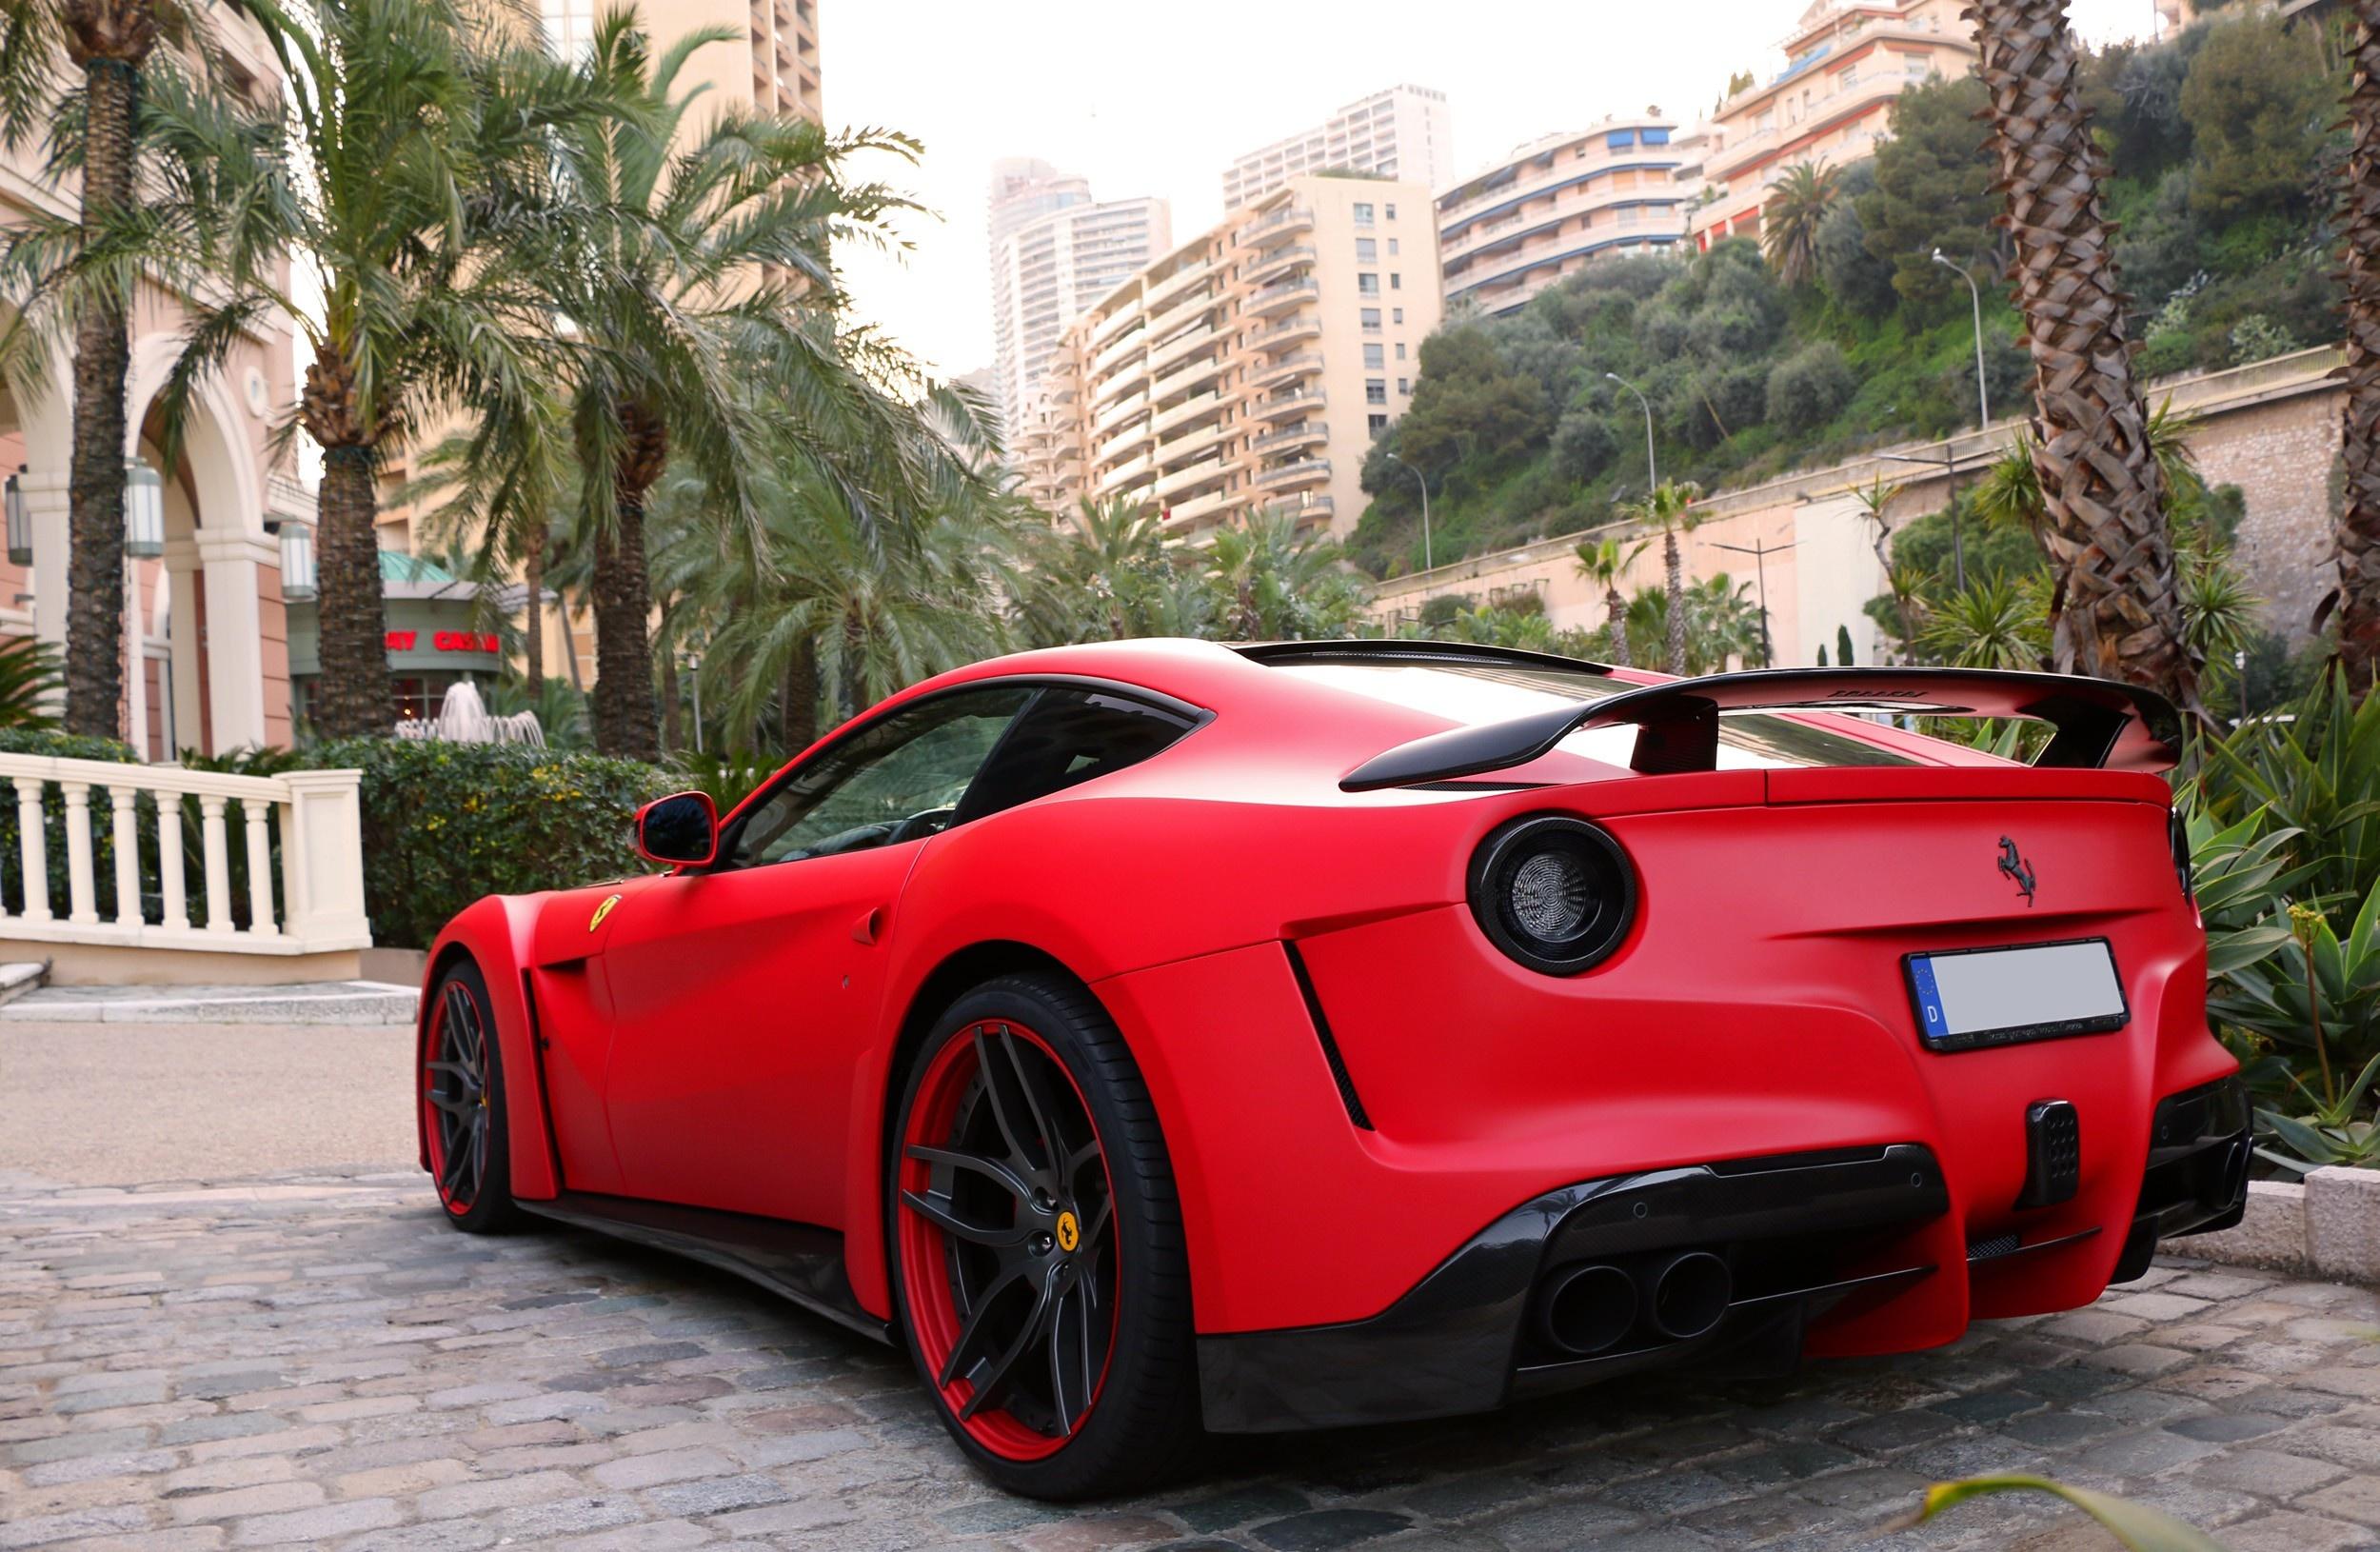 86728 download wallpaper Supercar, Cars, Ferrari, Berlinetta, F12, Novitec Rosso, N-Largo screensavers and pictures for free